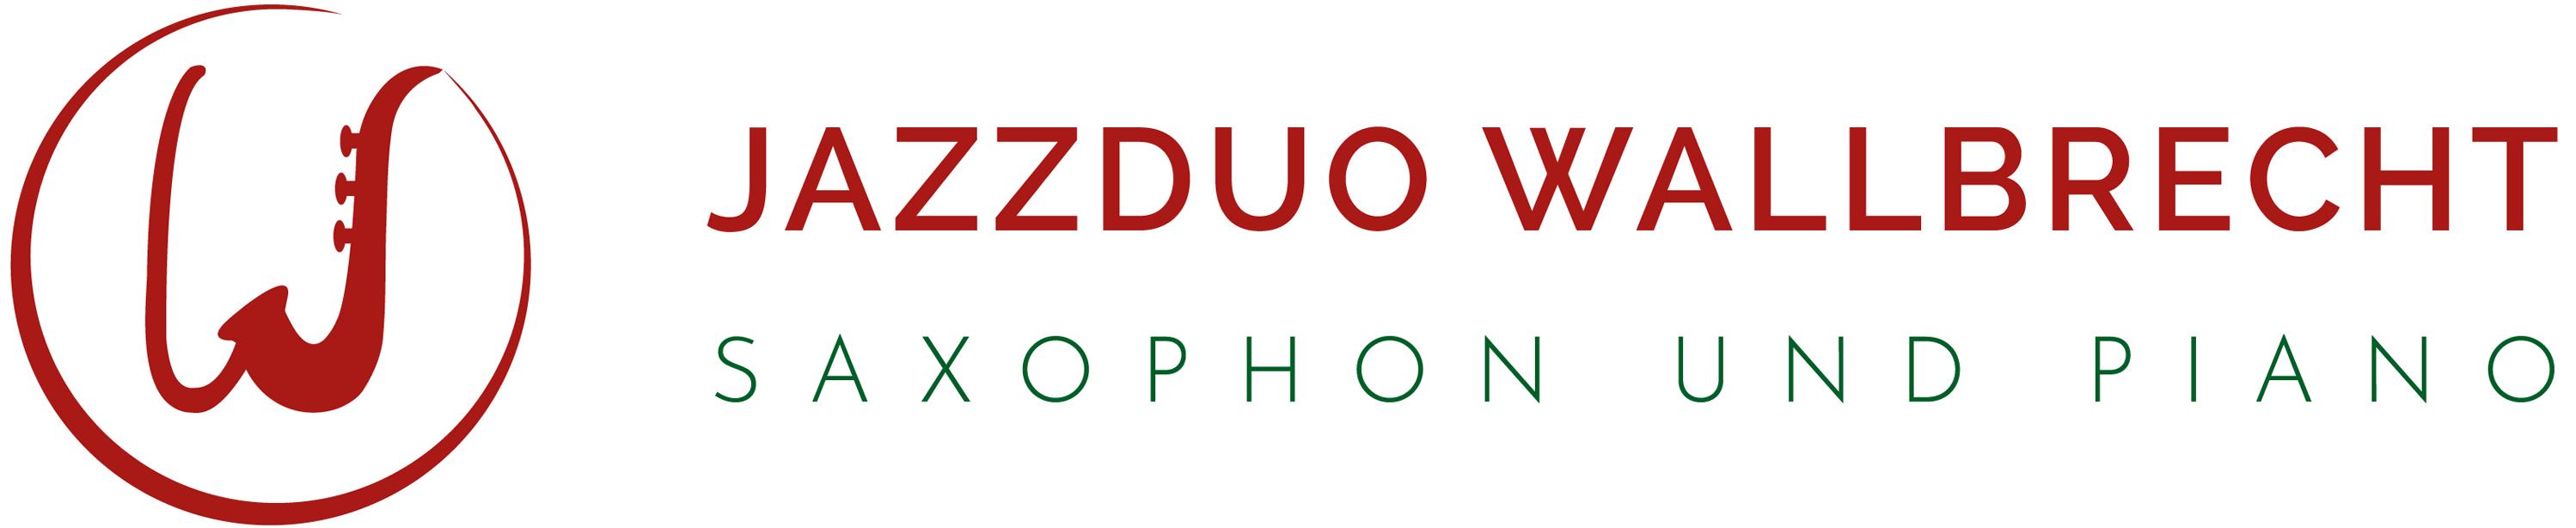 Jazzduo Wallbrecht Logo